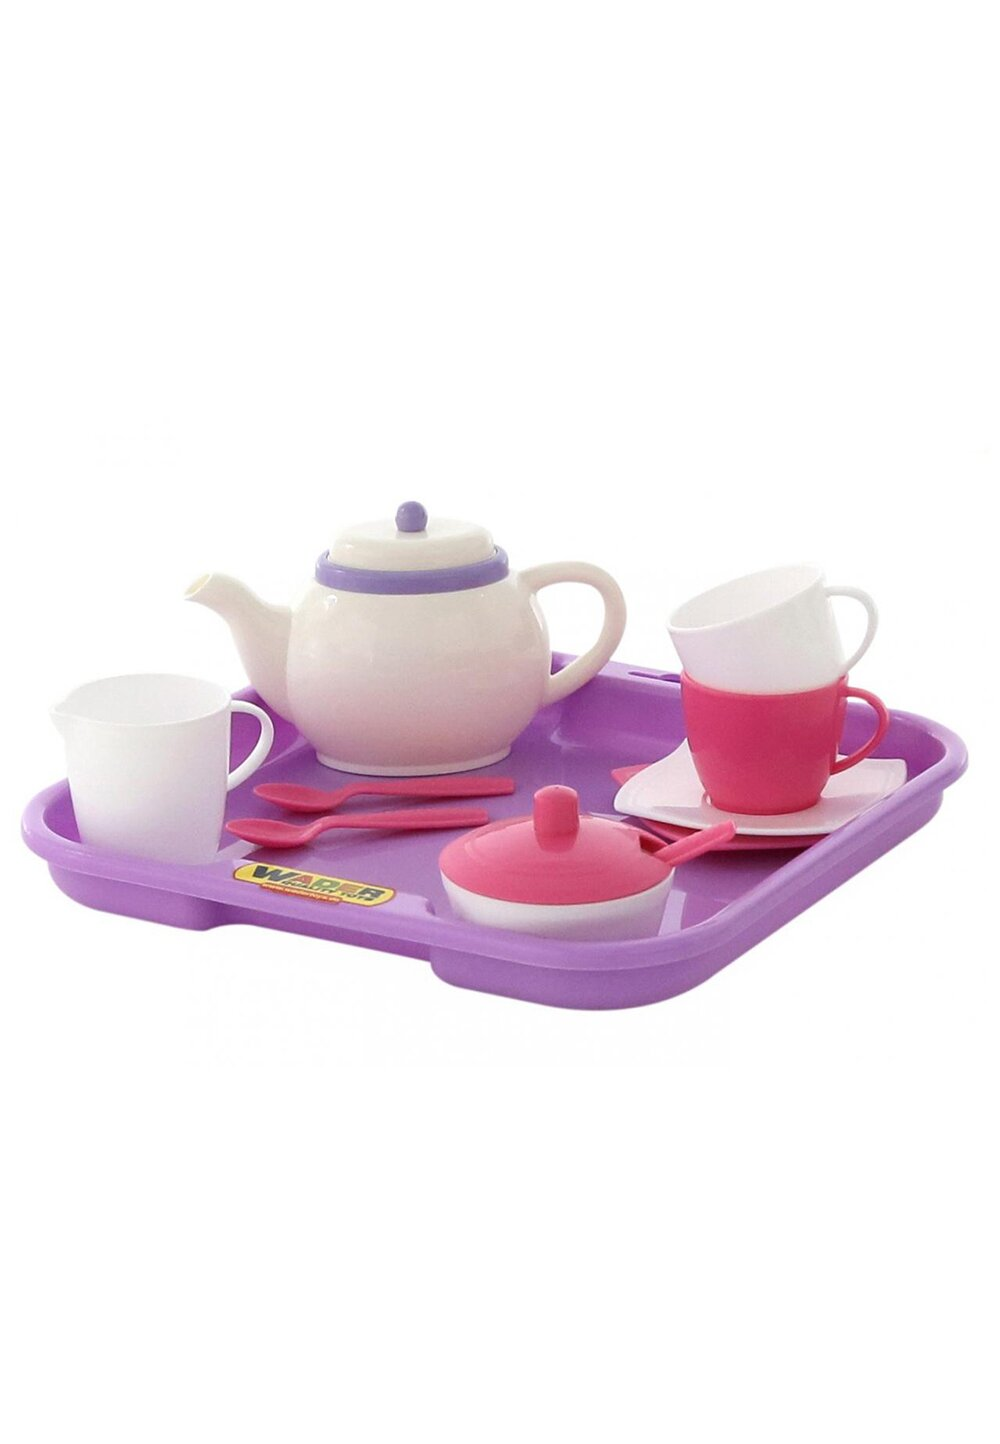 Set ceai, 13 piese, alb cu roz imagine